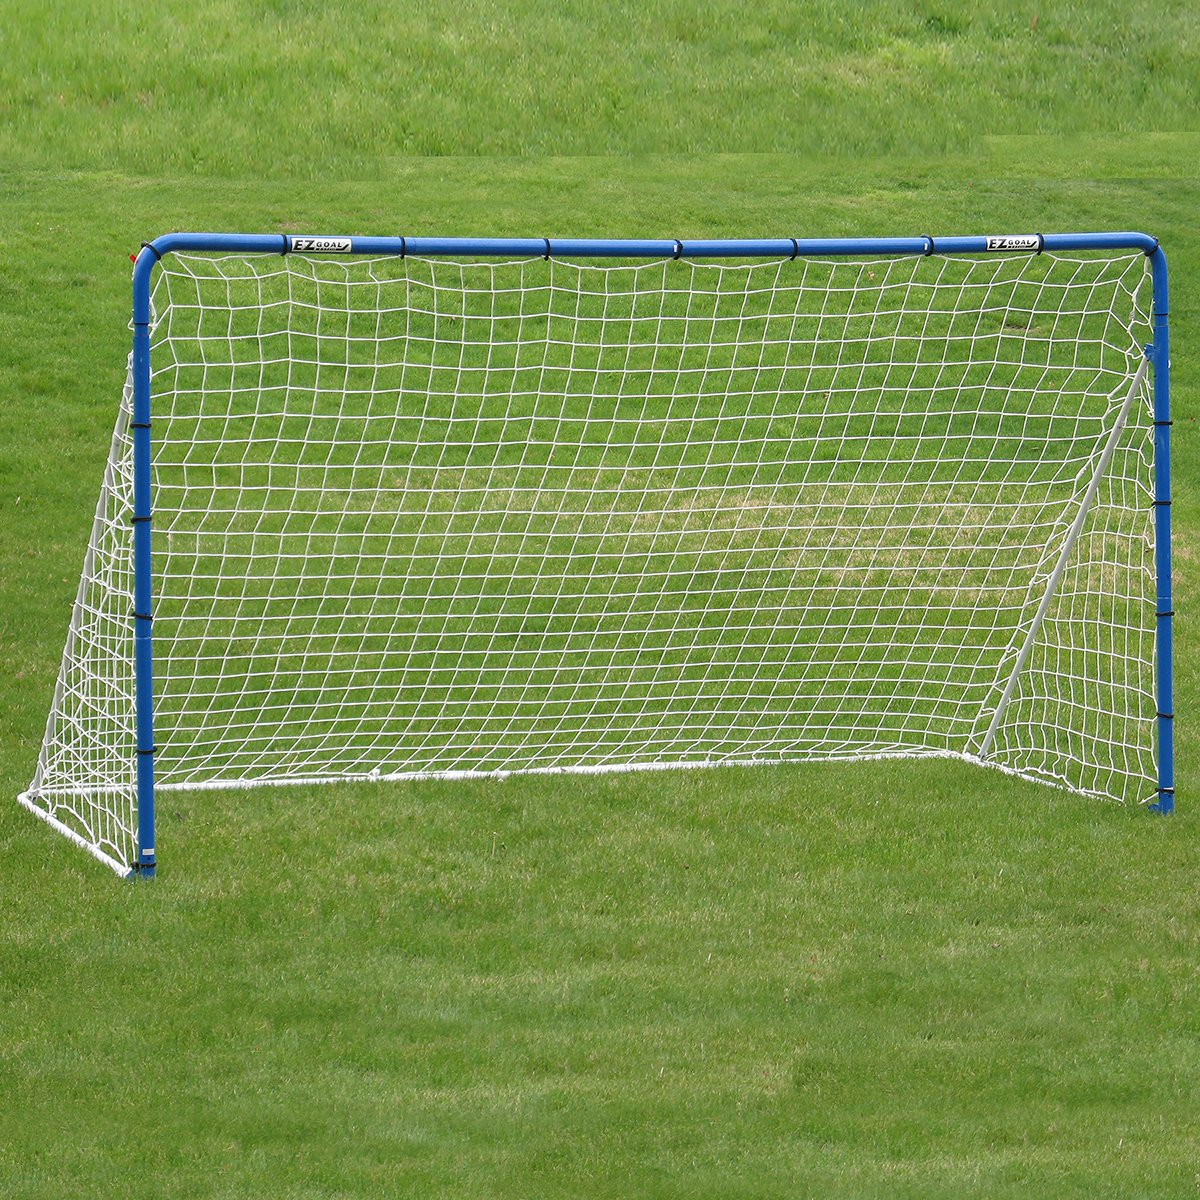 amazon com ezgoal soccer goal net u0026 practice rebounder 12 u0027 x 6